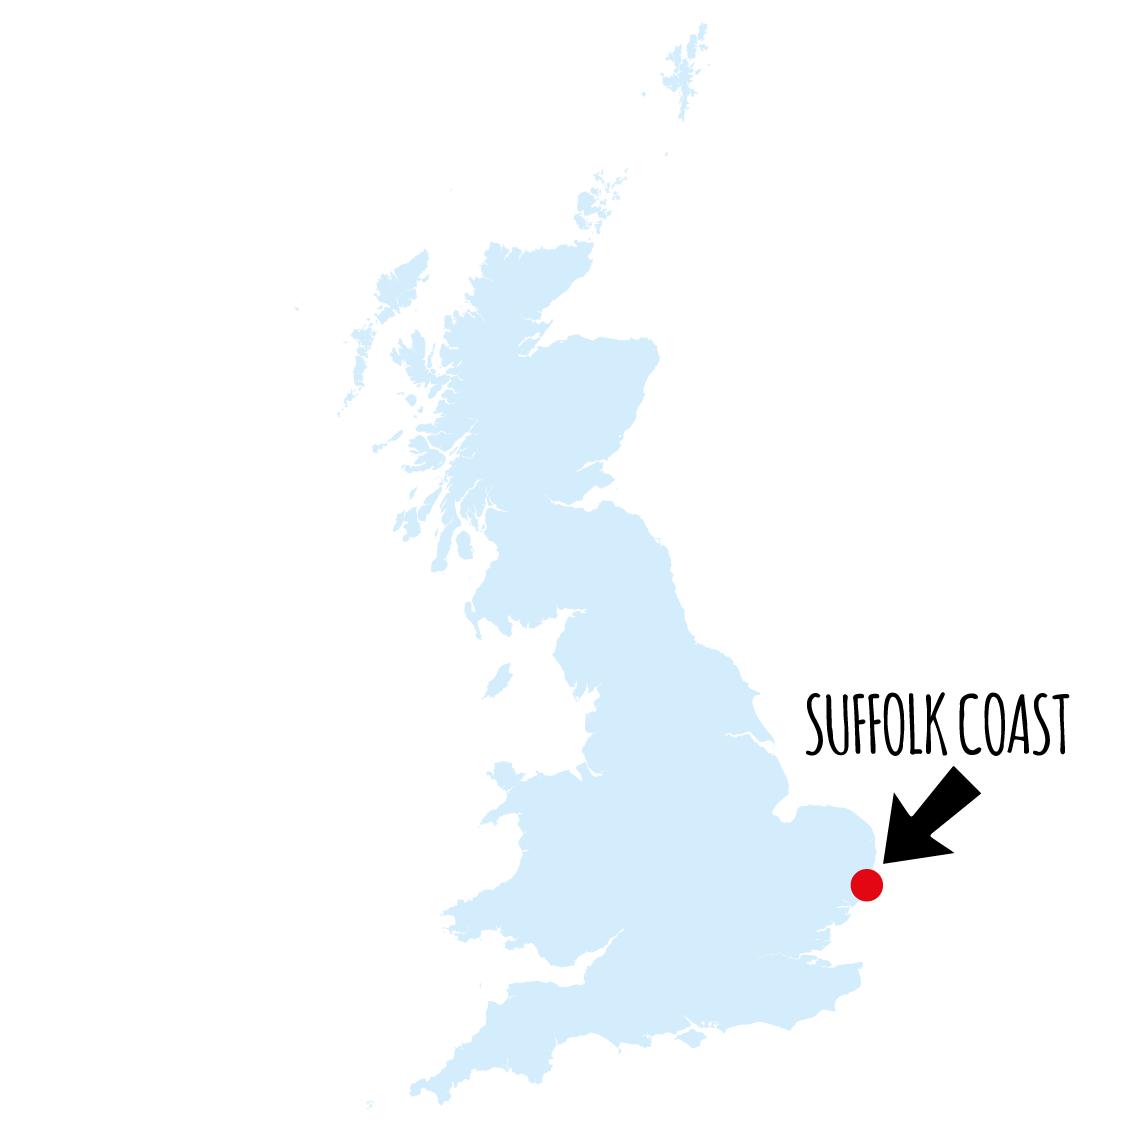 suffolk-coast-map.png